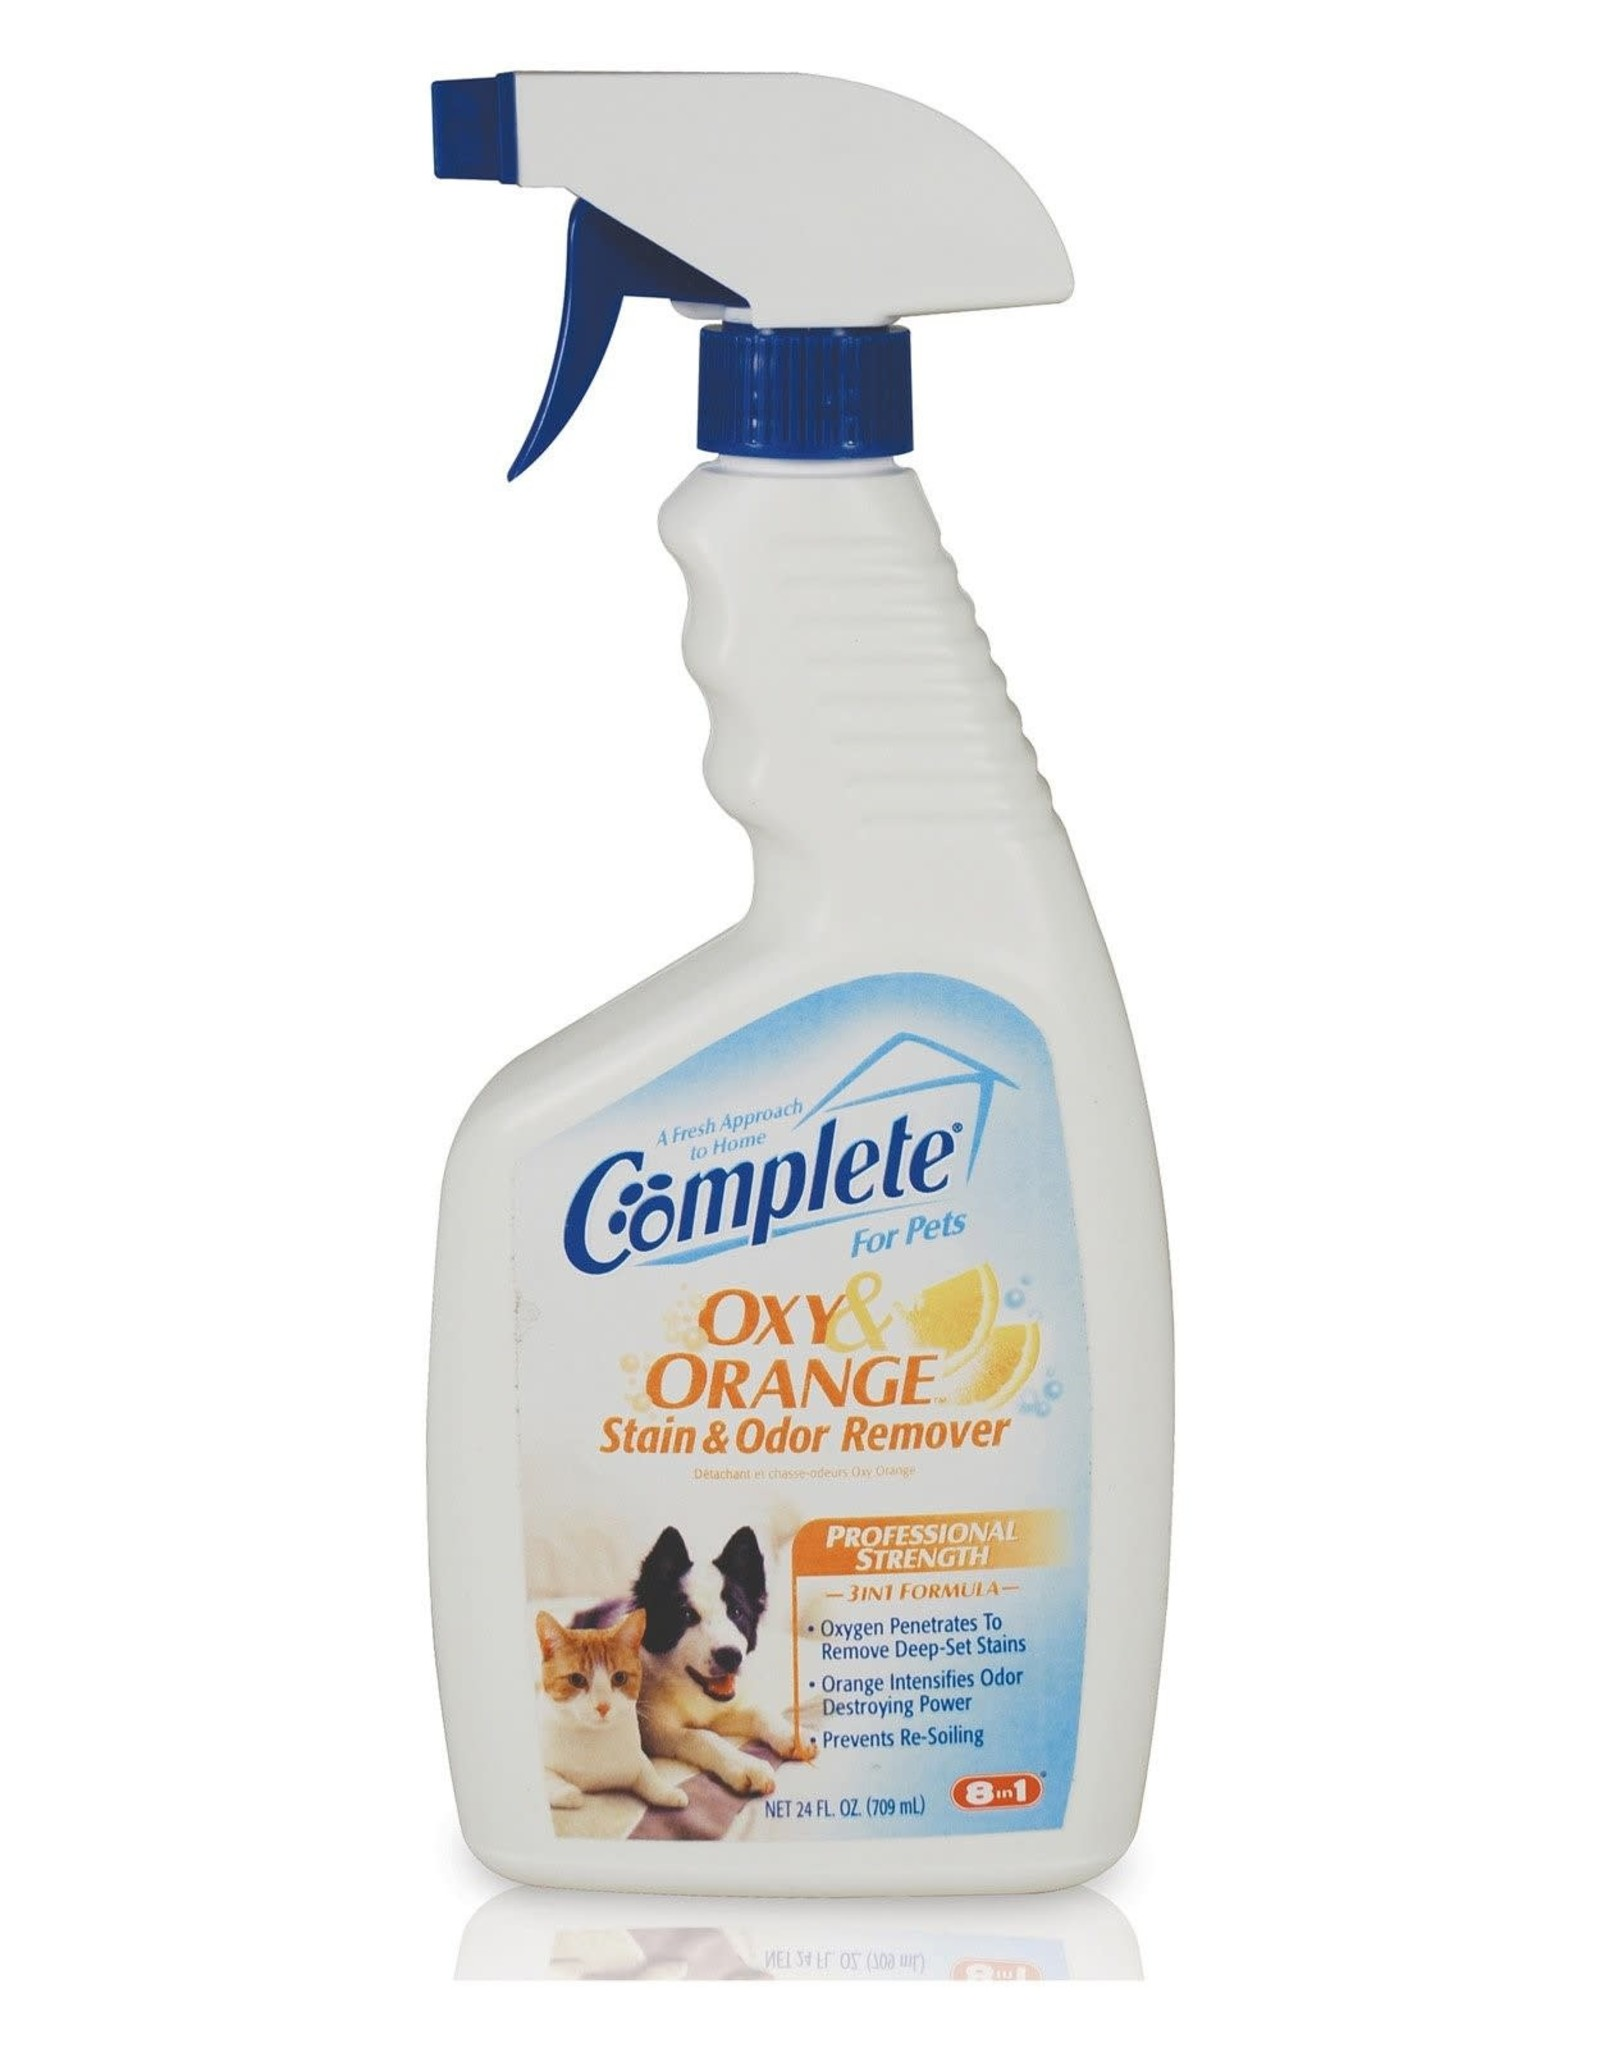 8in1 Complete Oxy Orange Stain & Odor Remover 24 oz